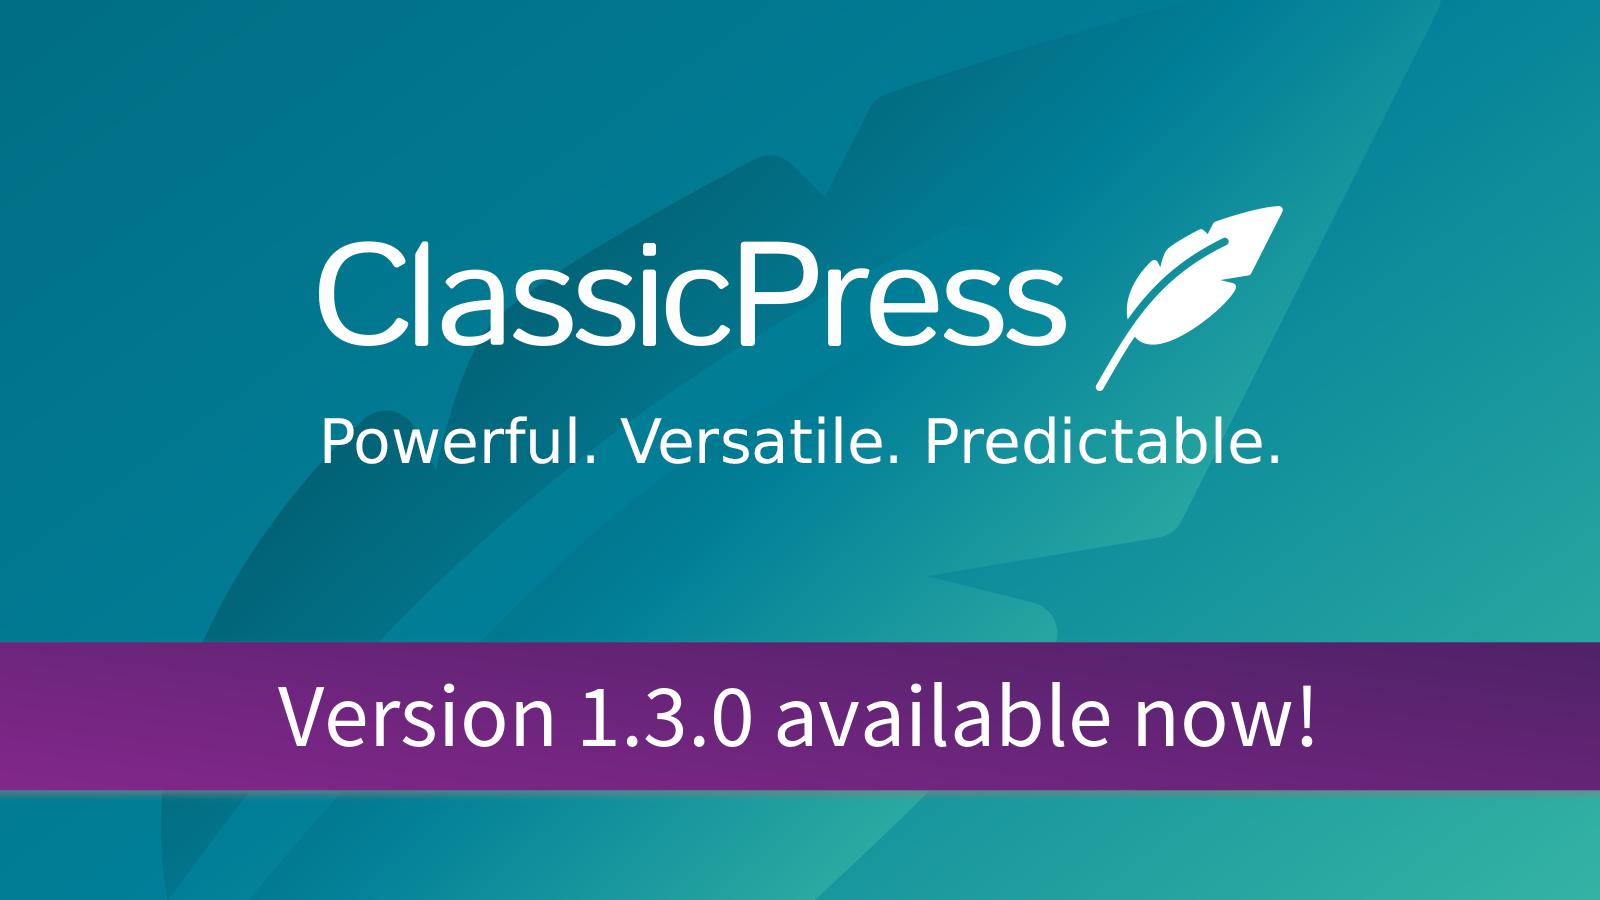 ClassicPress Release Banner V1.3.0